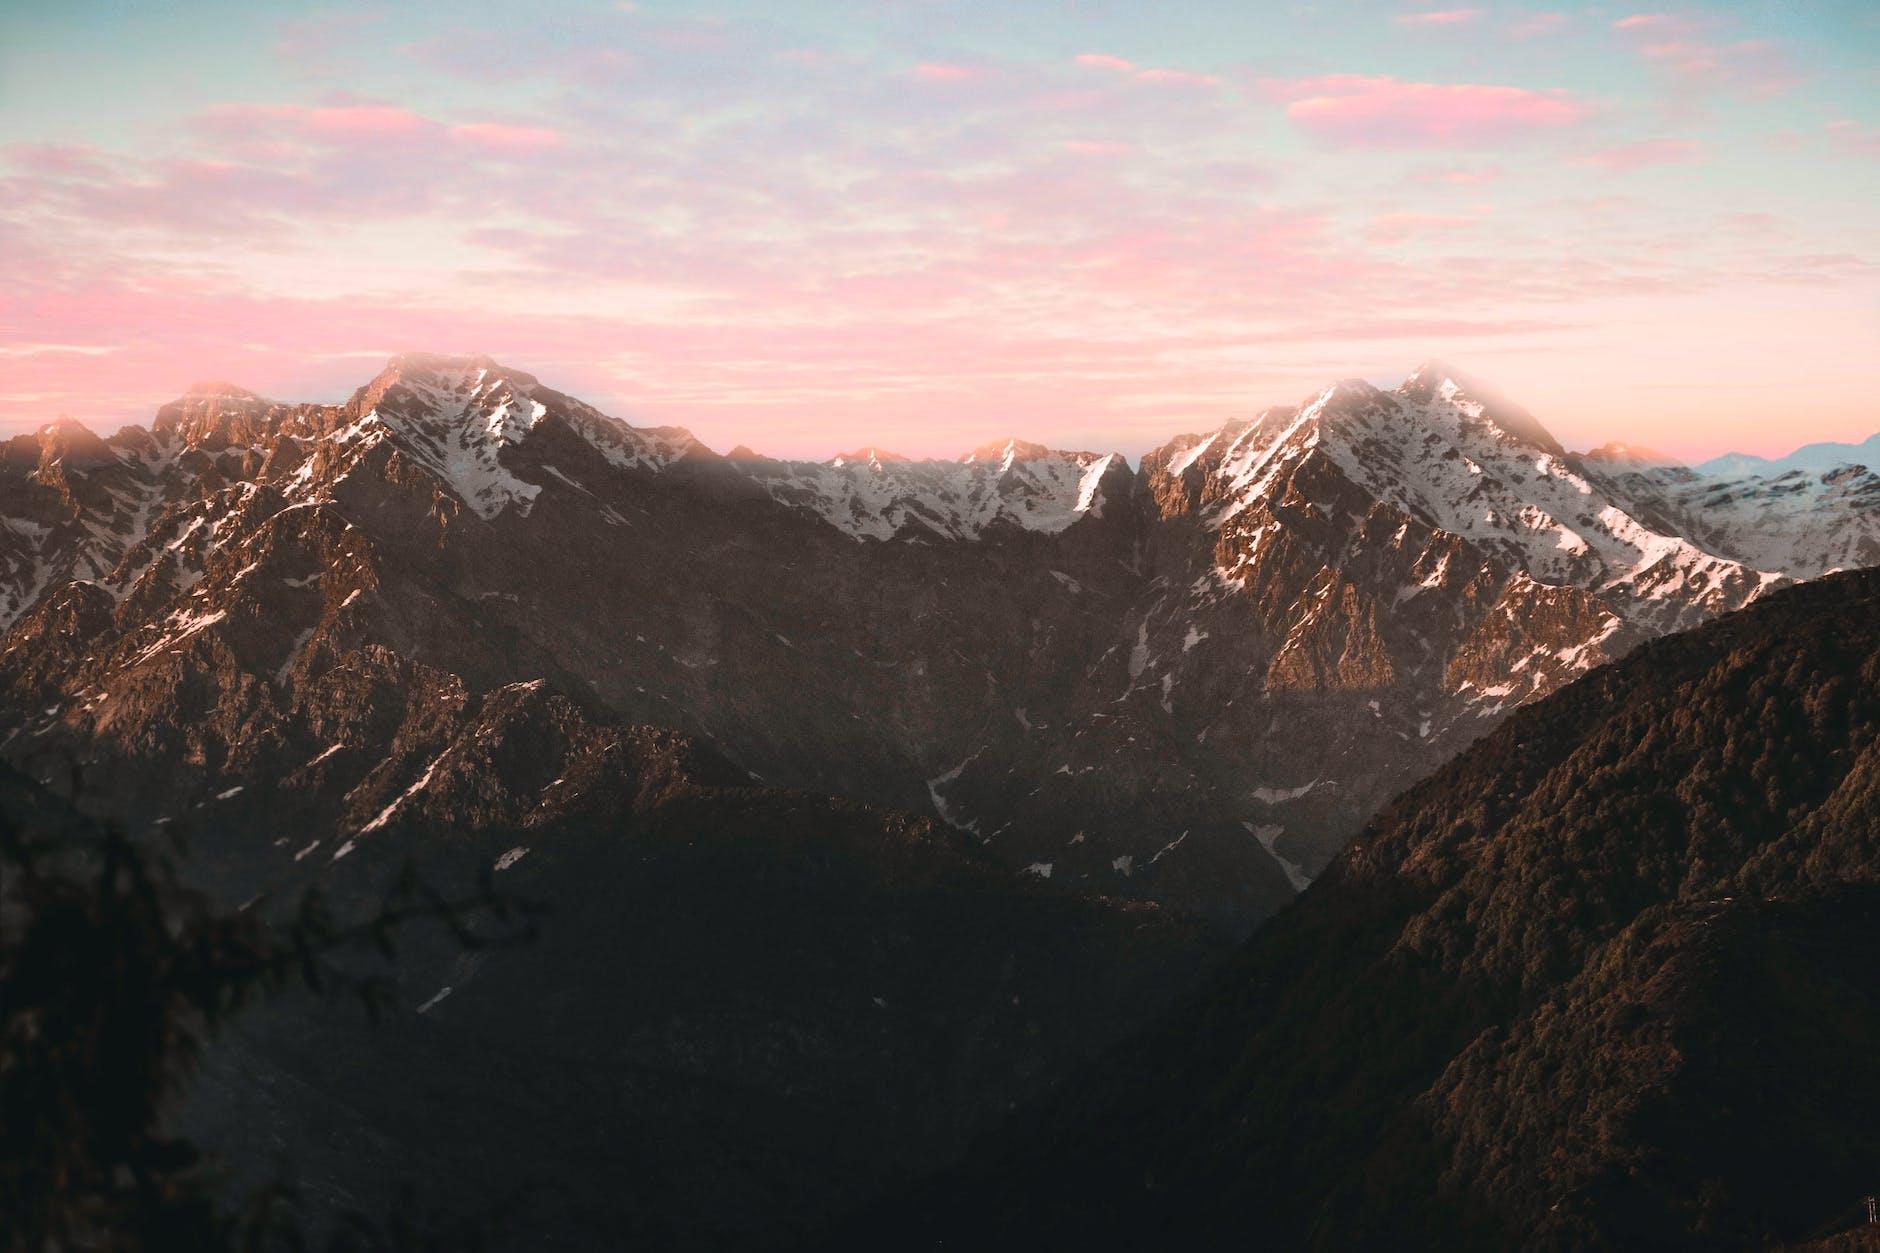 Solang Valley - Visit Himachal Pradesh